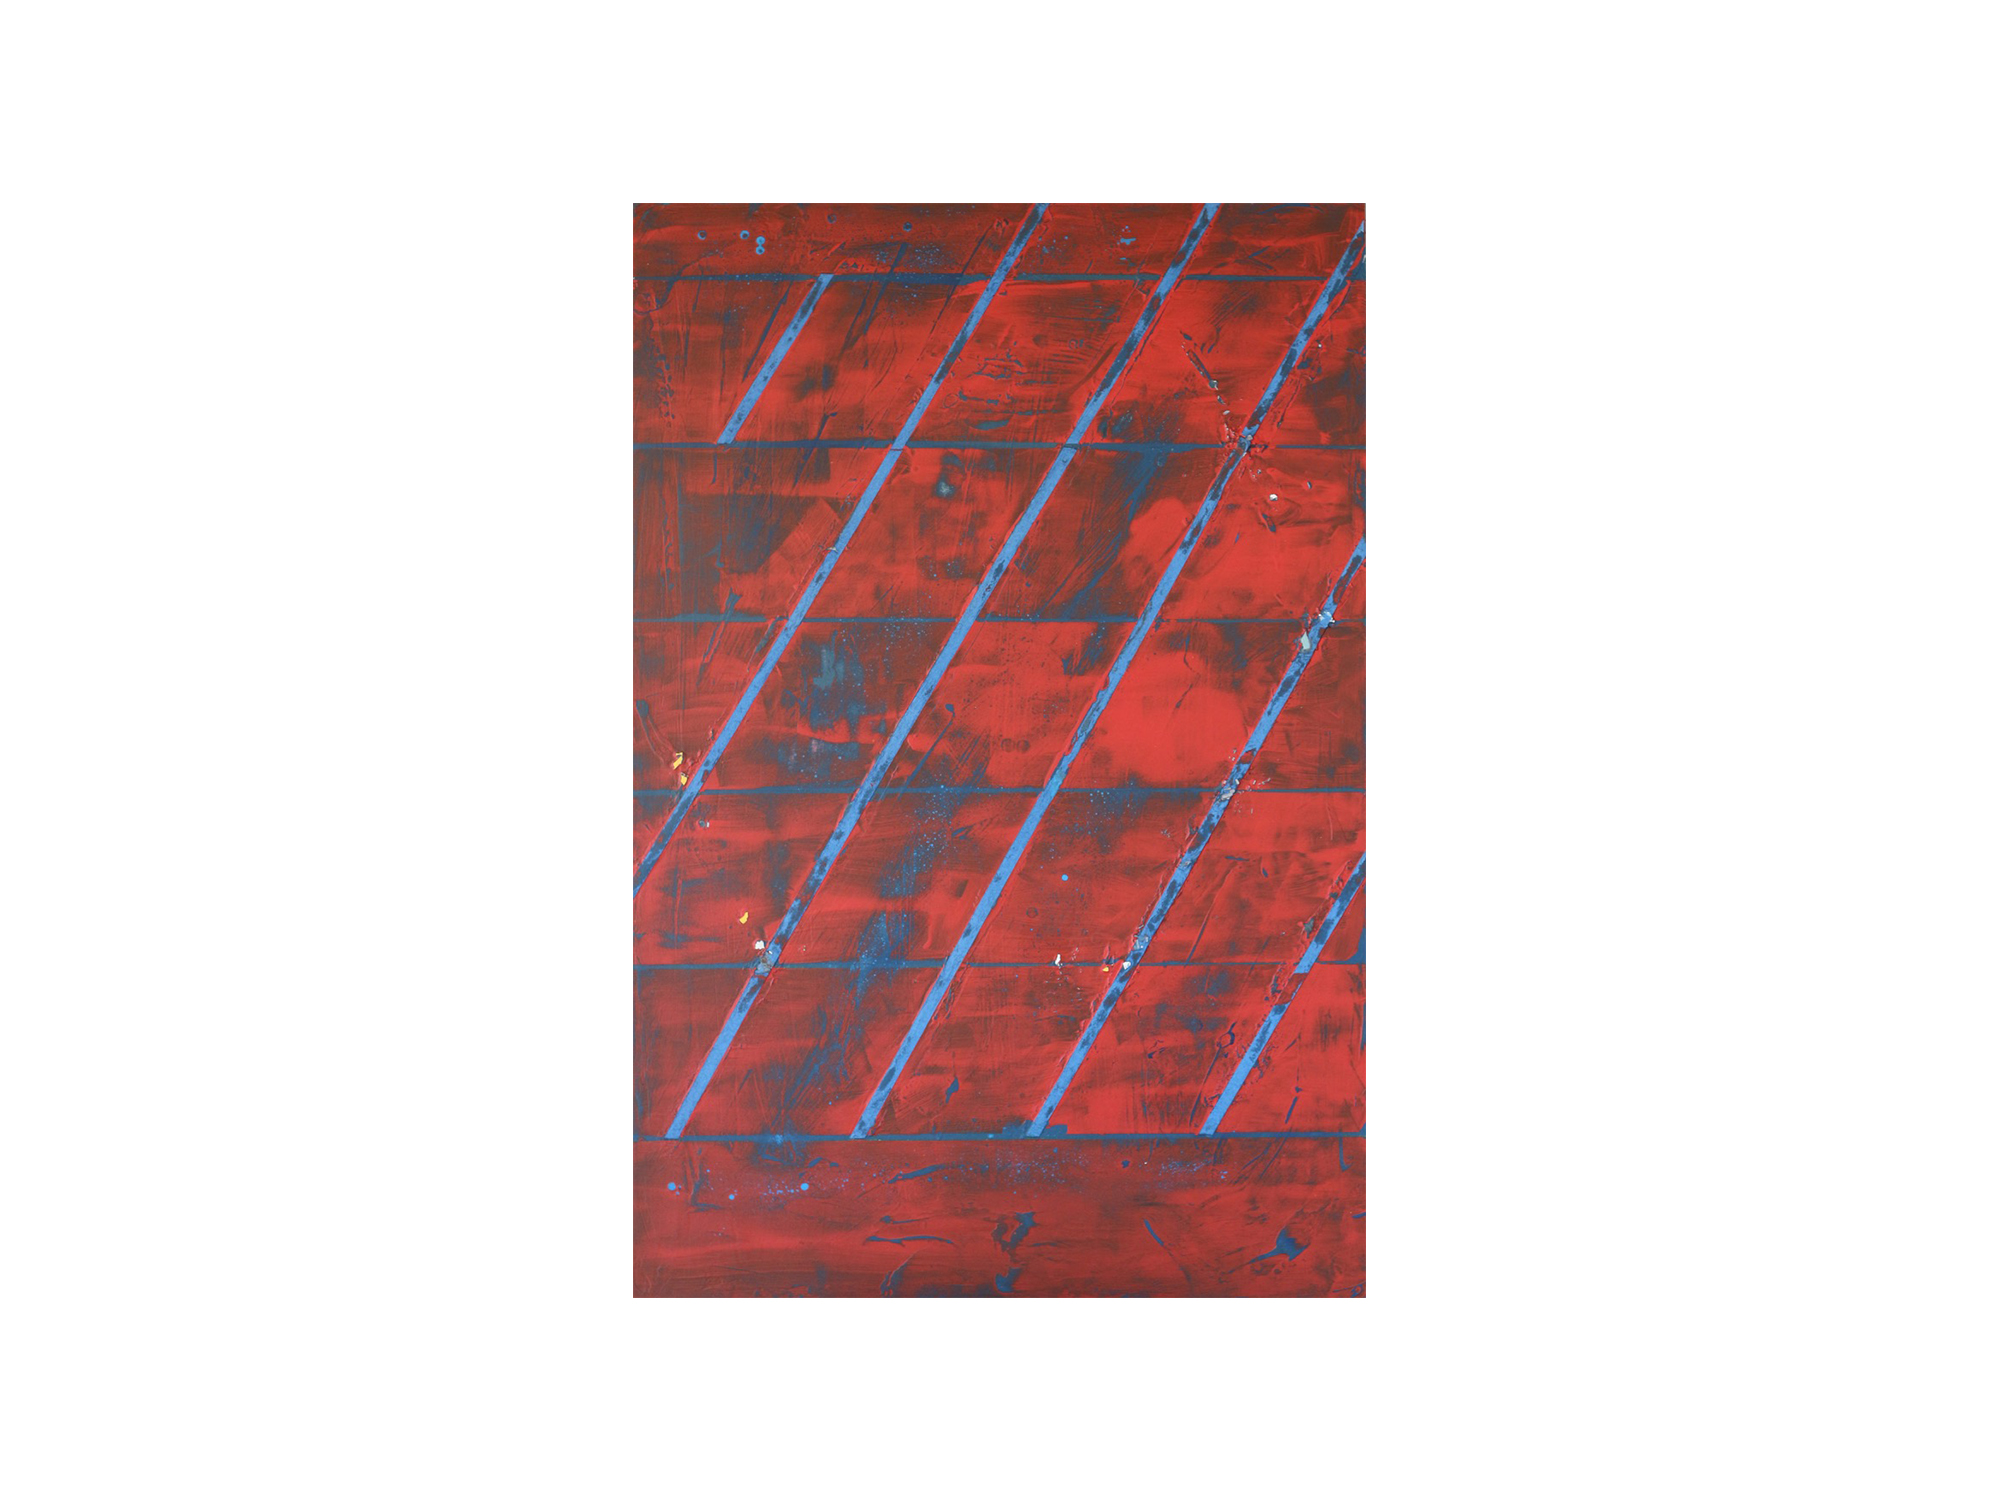 Tom Vincent    Univers(al) Grid , 2016 acrylic, selenite, paper and aerosol on board 90 x 60cm   ARTIST BIO